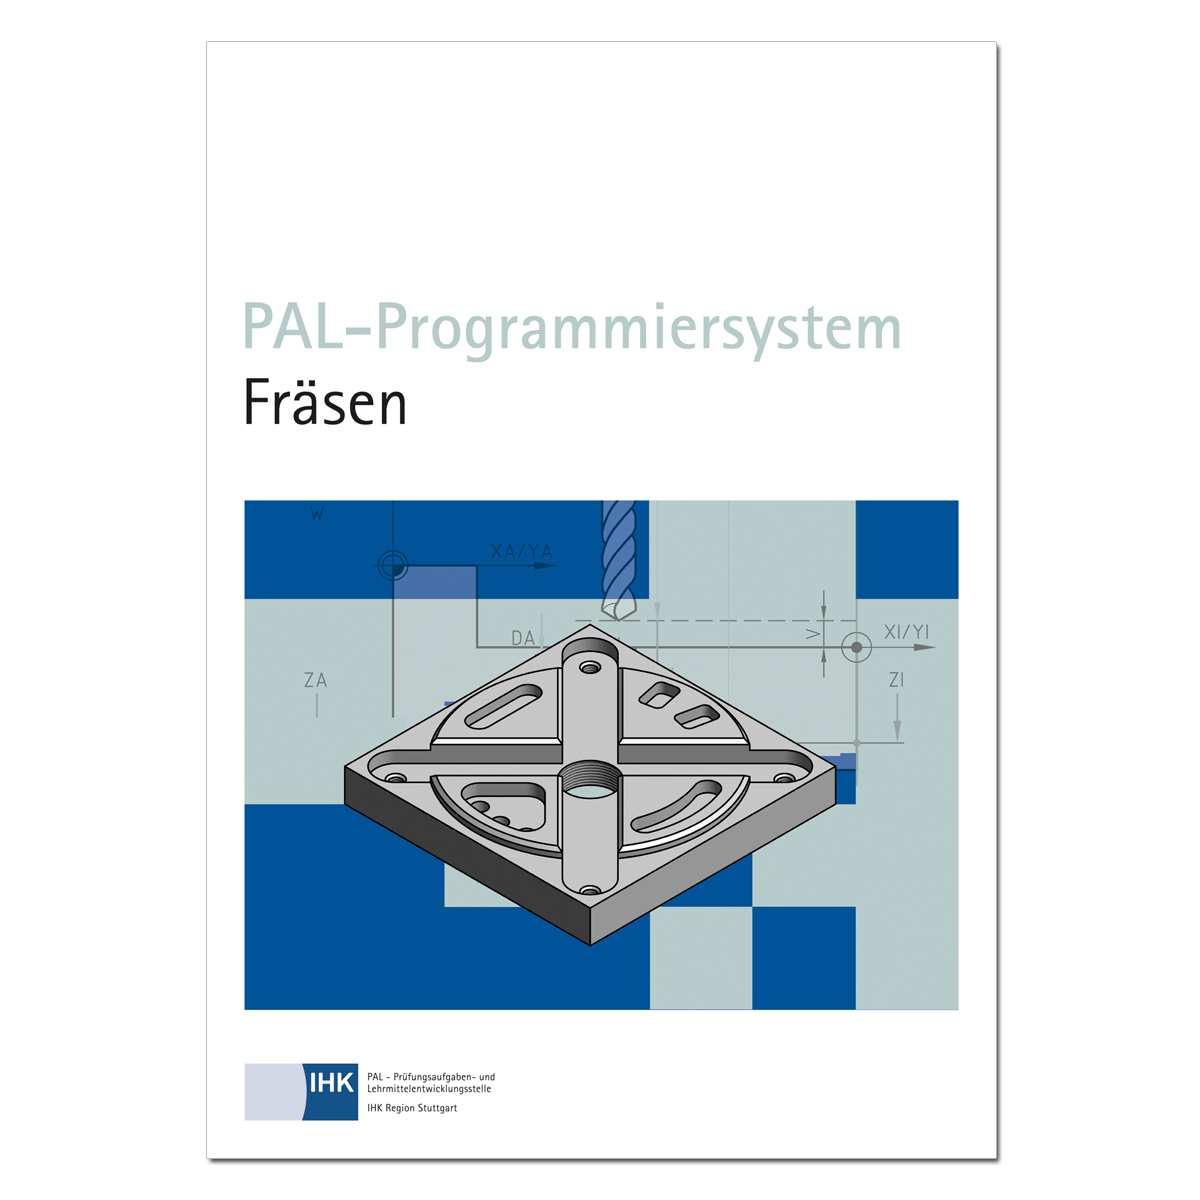 Pal Programmiersystem Frasen